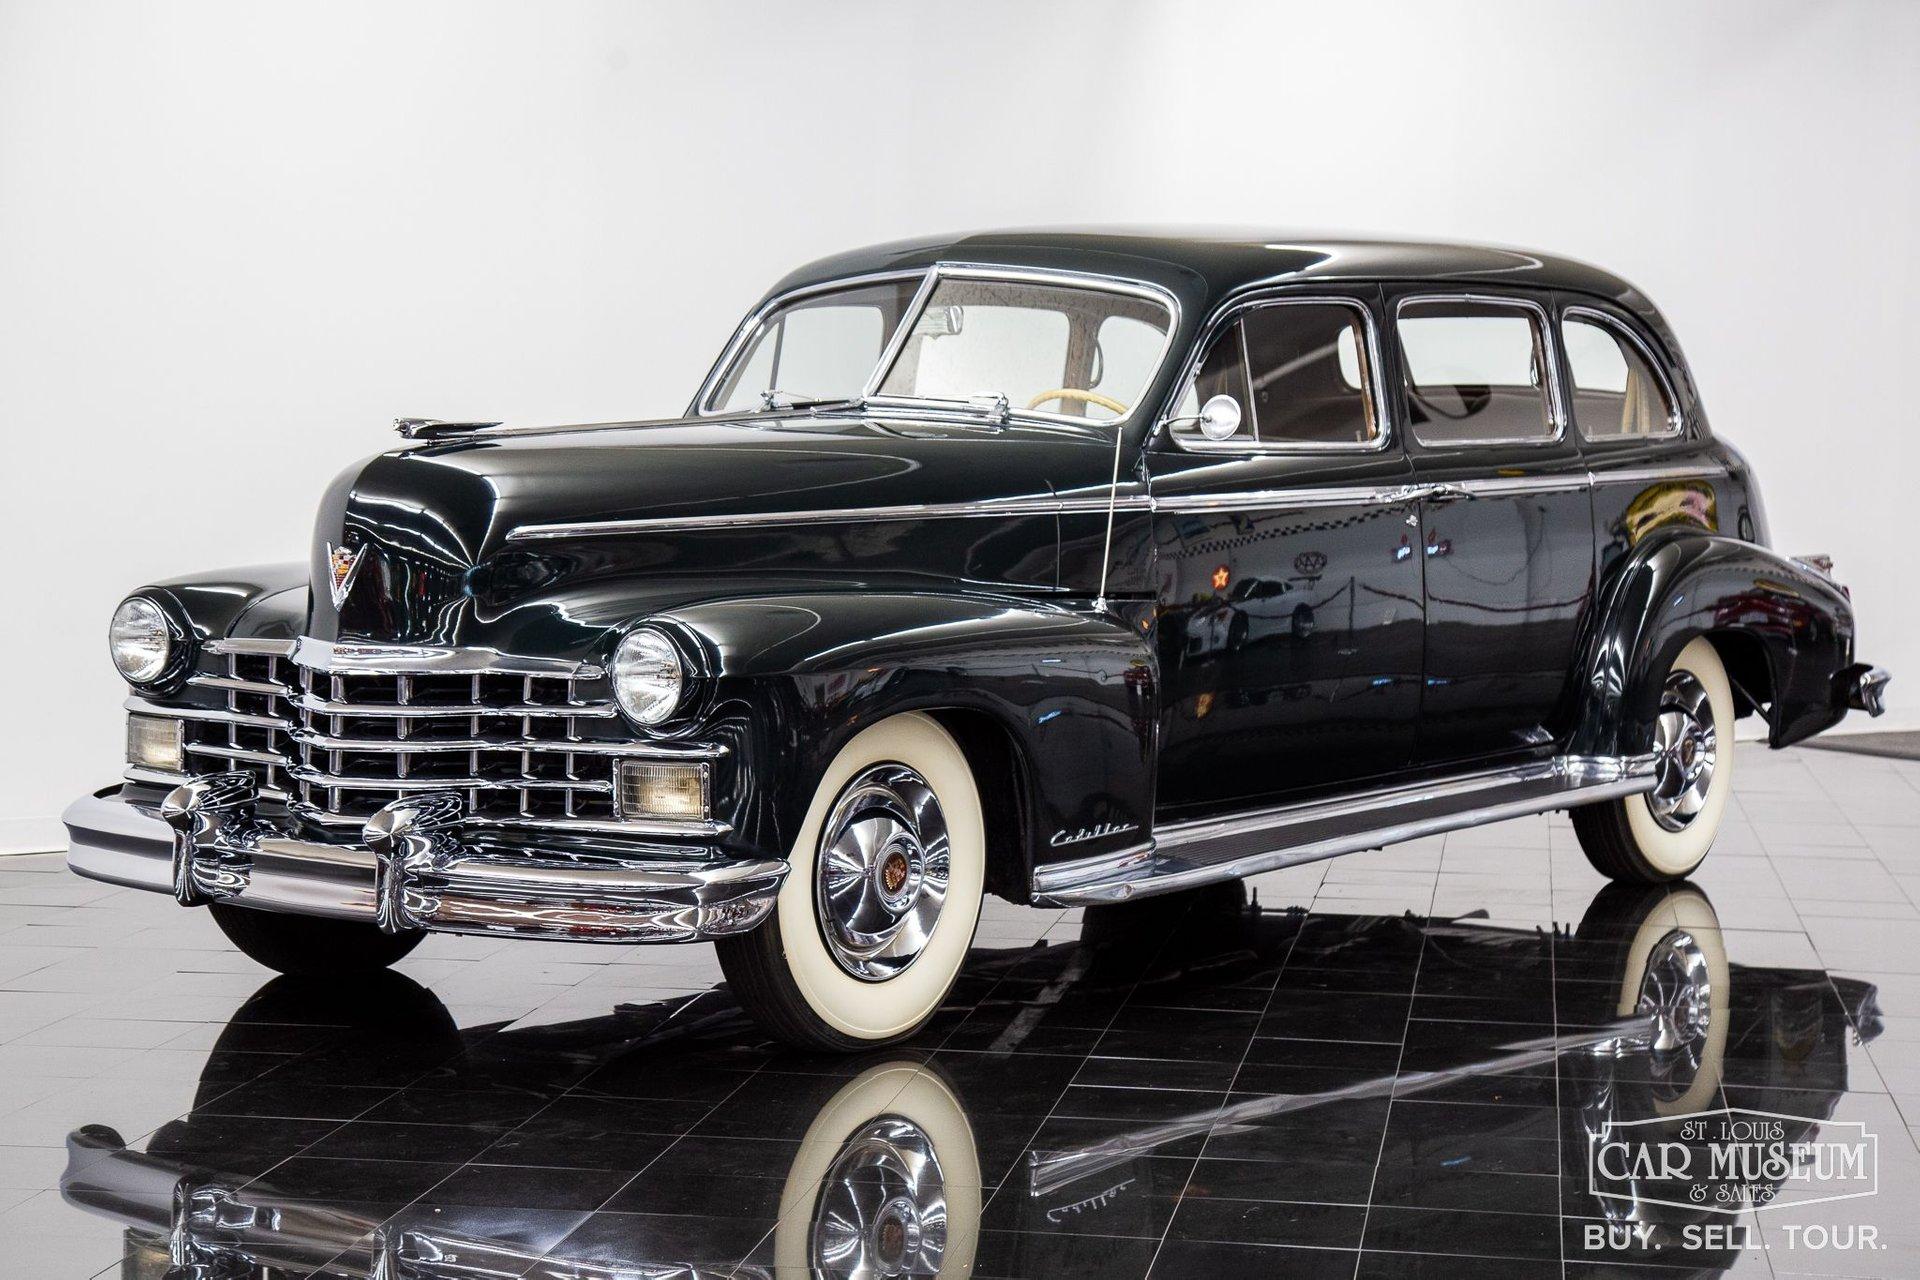 1947 cadillac fleetwood 75 7 passenger